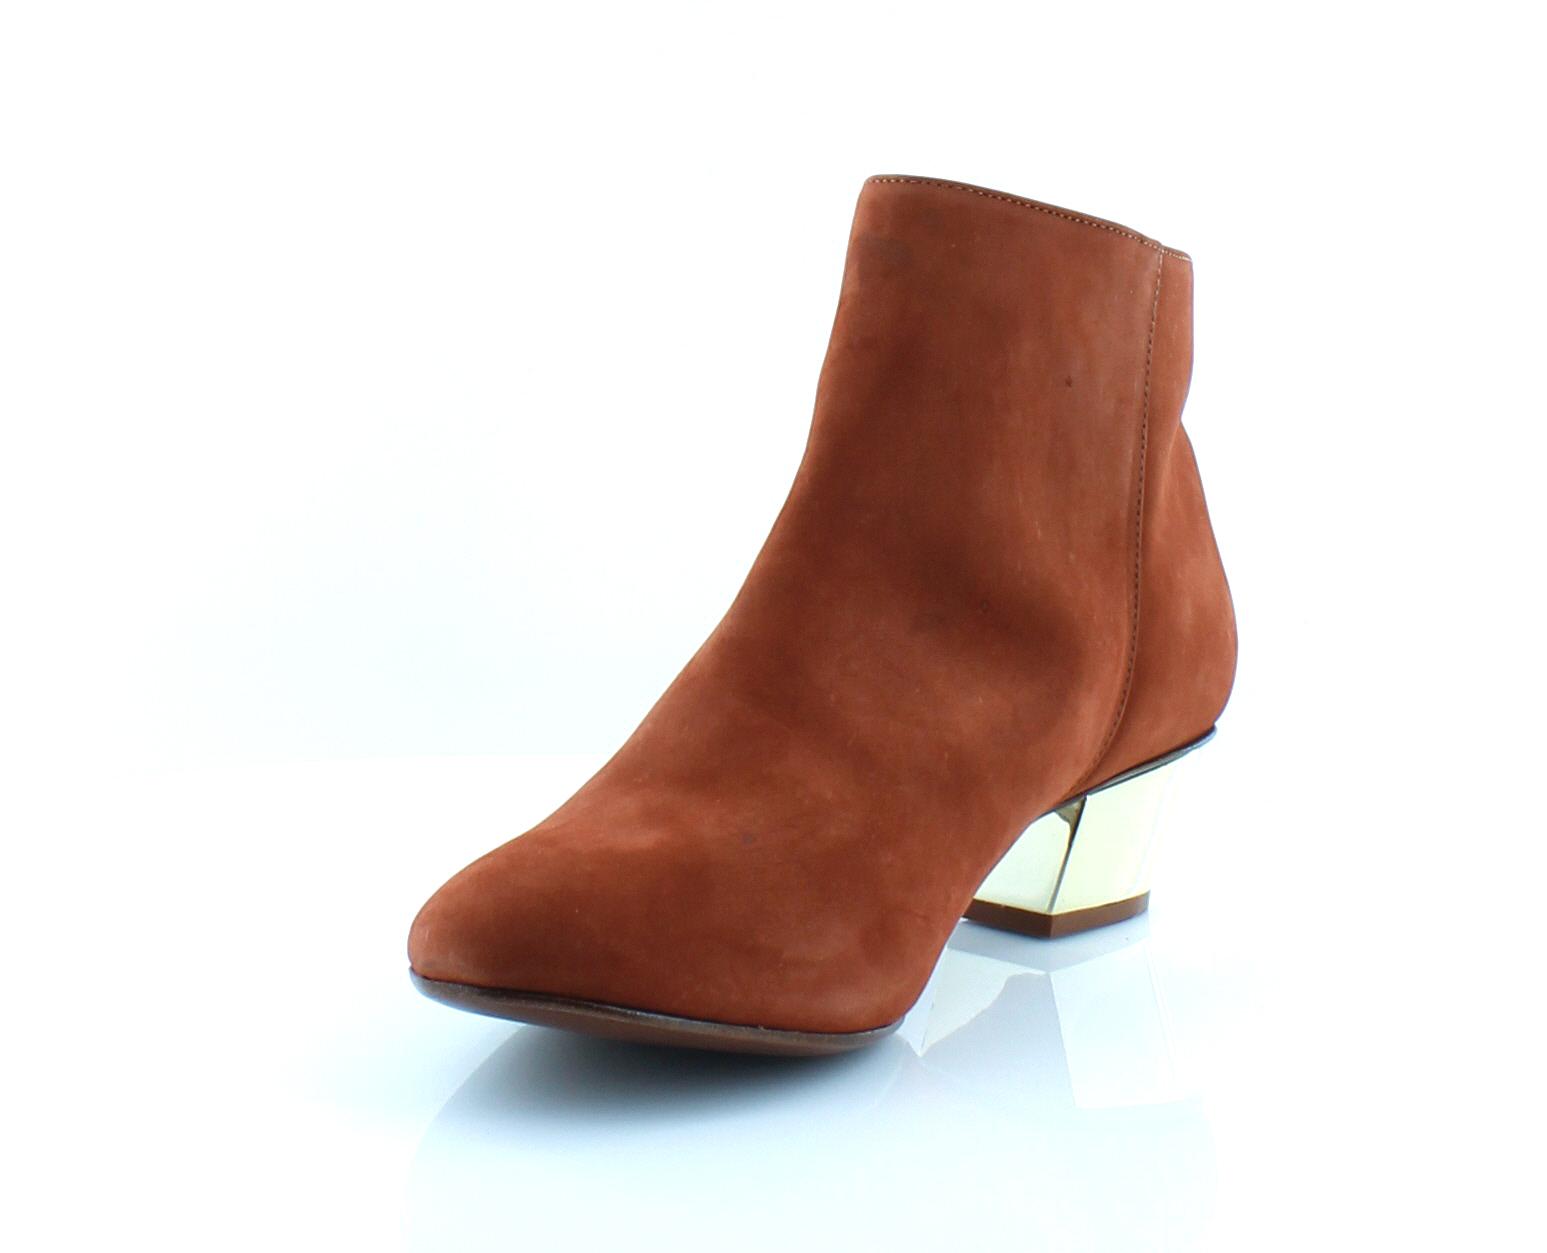 pierazzoli gomme arezzo shoes - photo#27